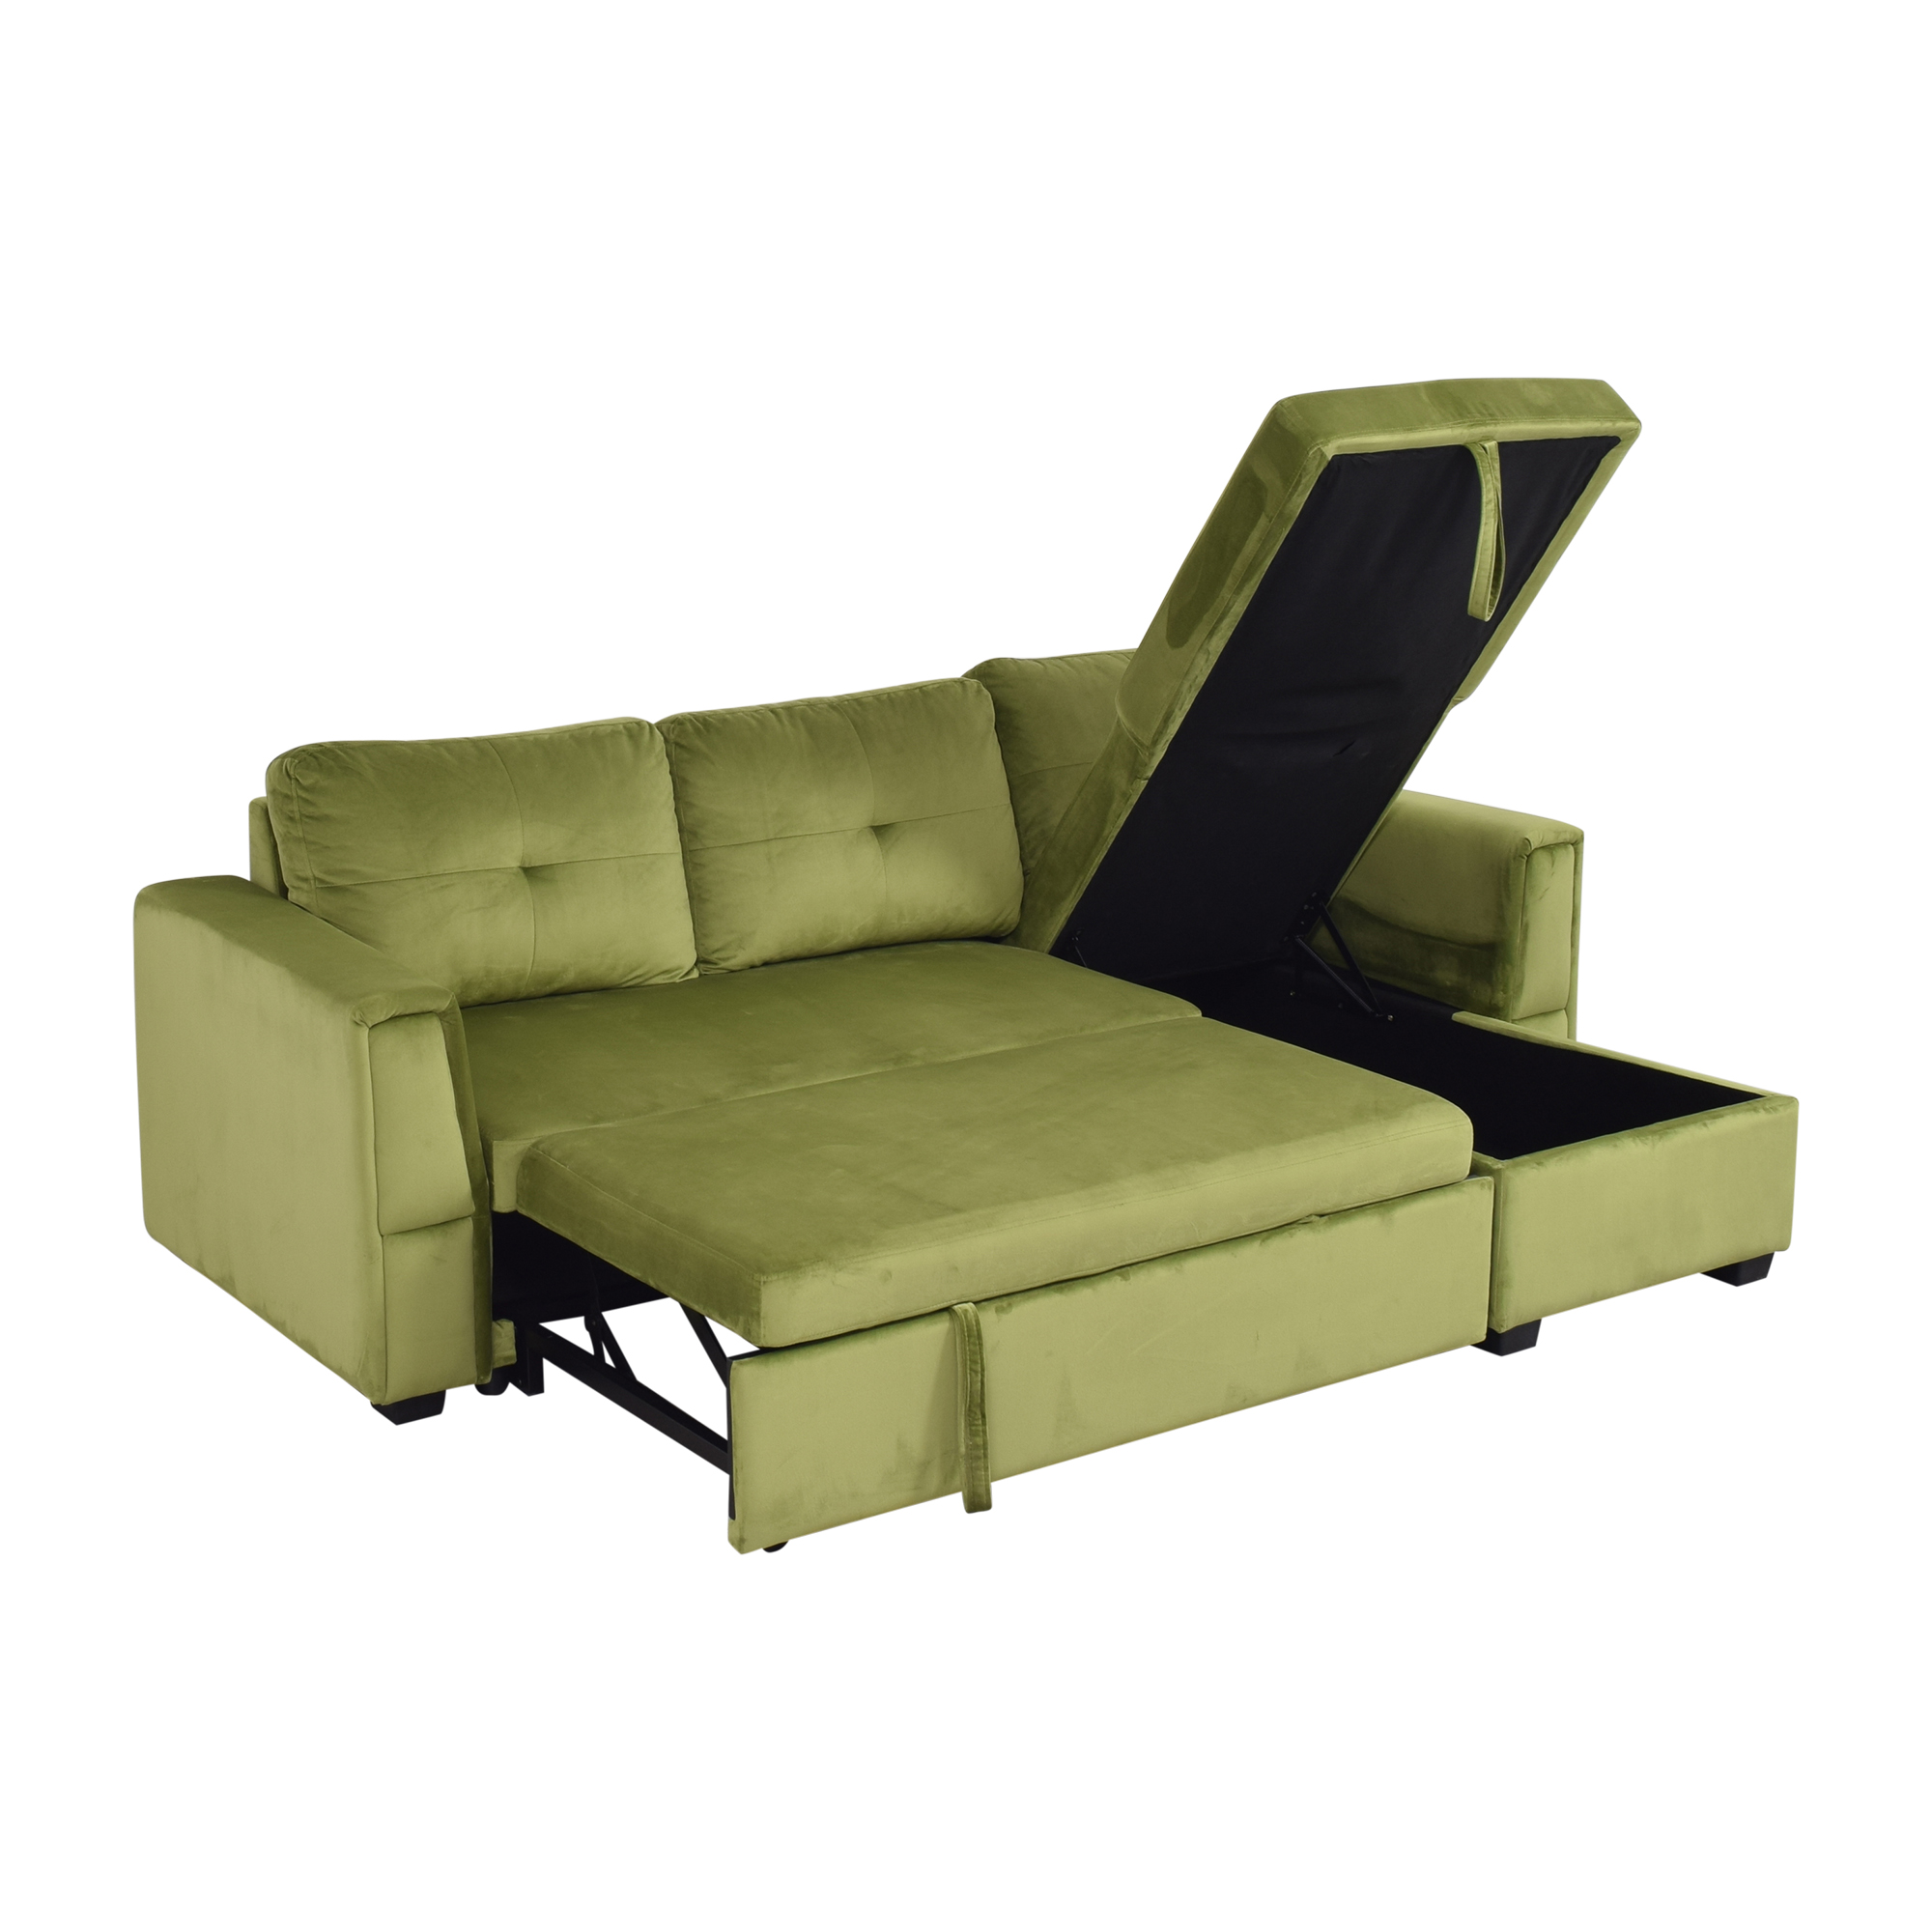 shop Wayfair Wayfair Mercer41 Nelda Round Arm Sleeper Sofa online